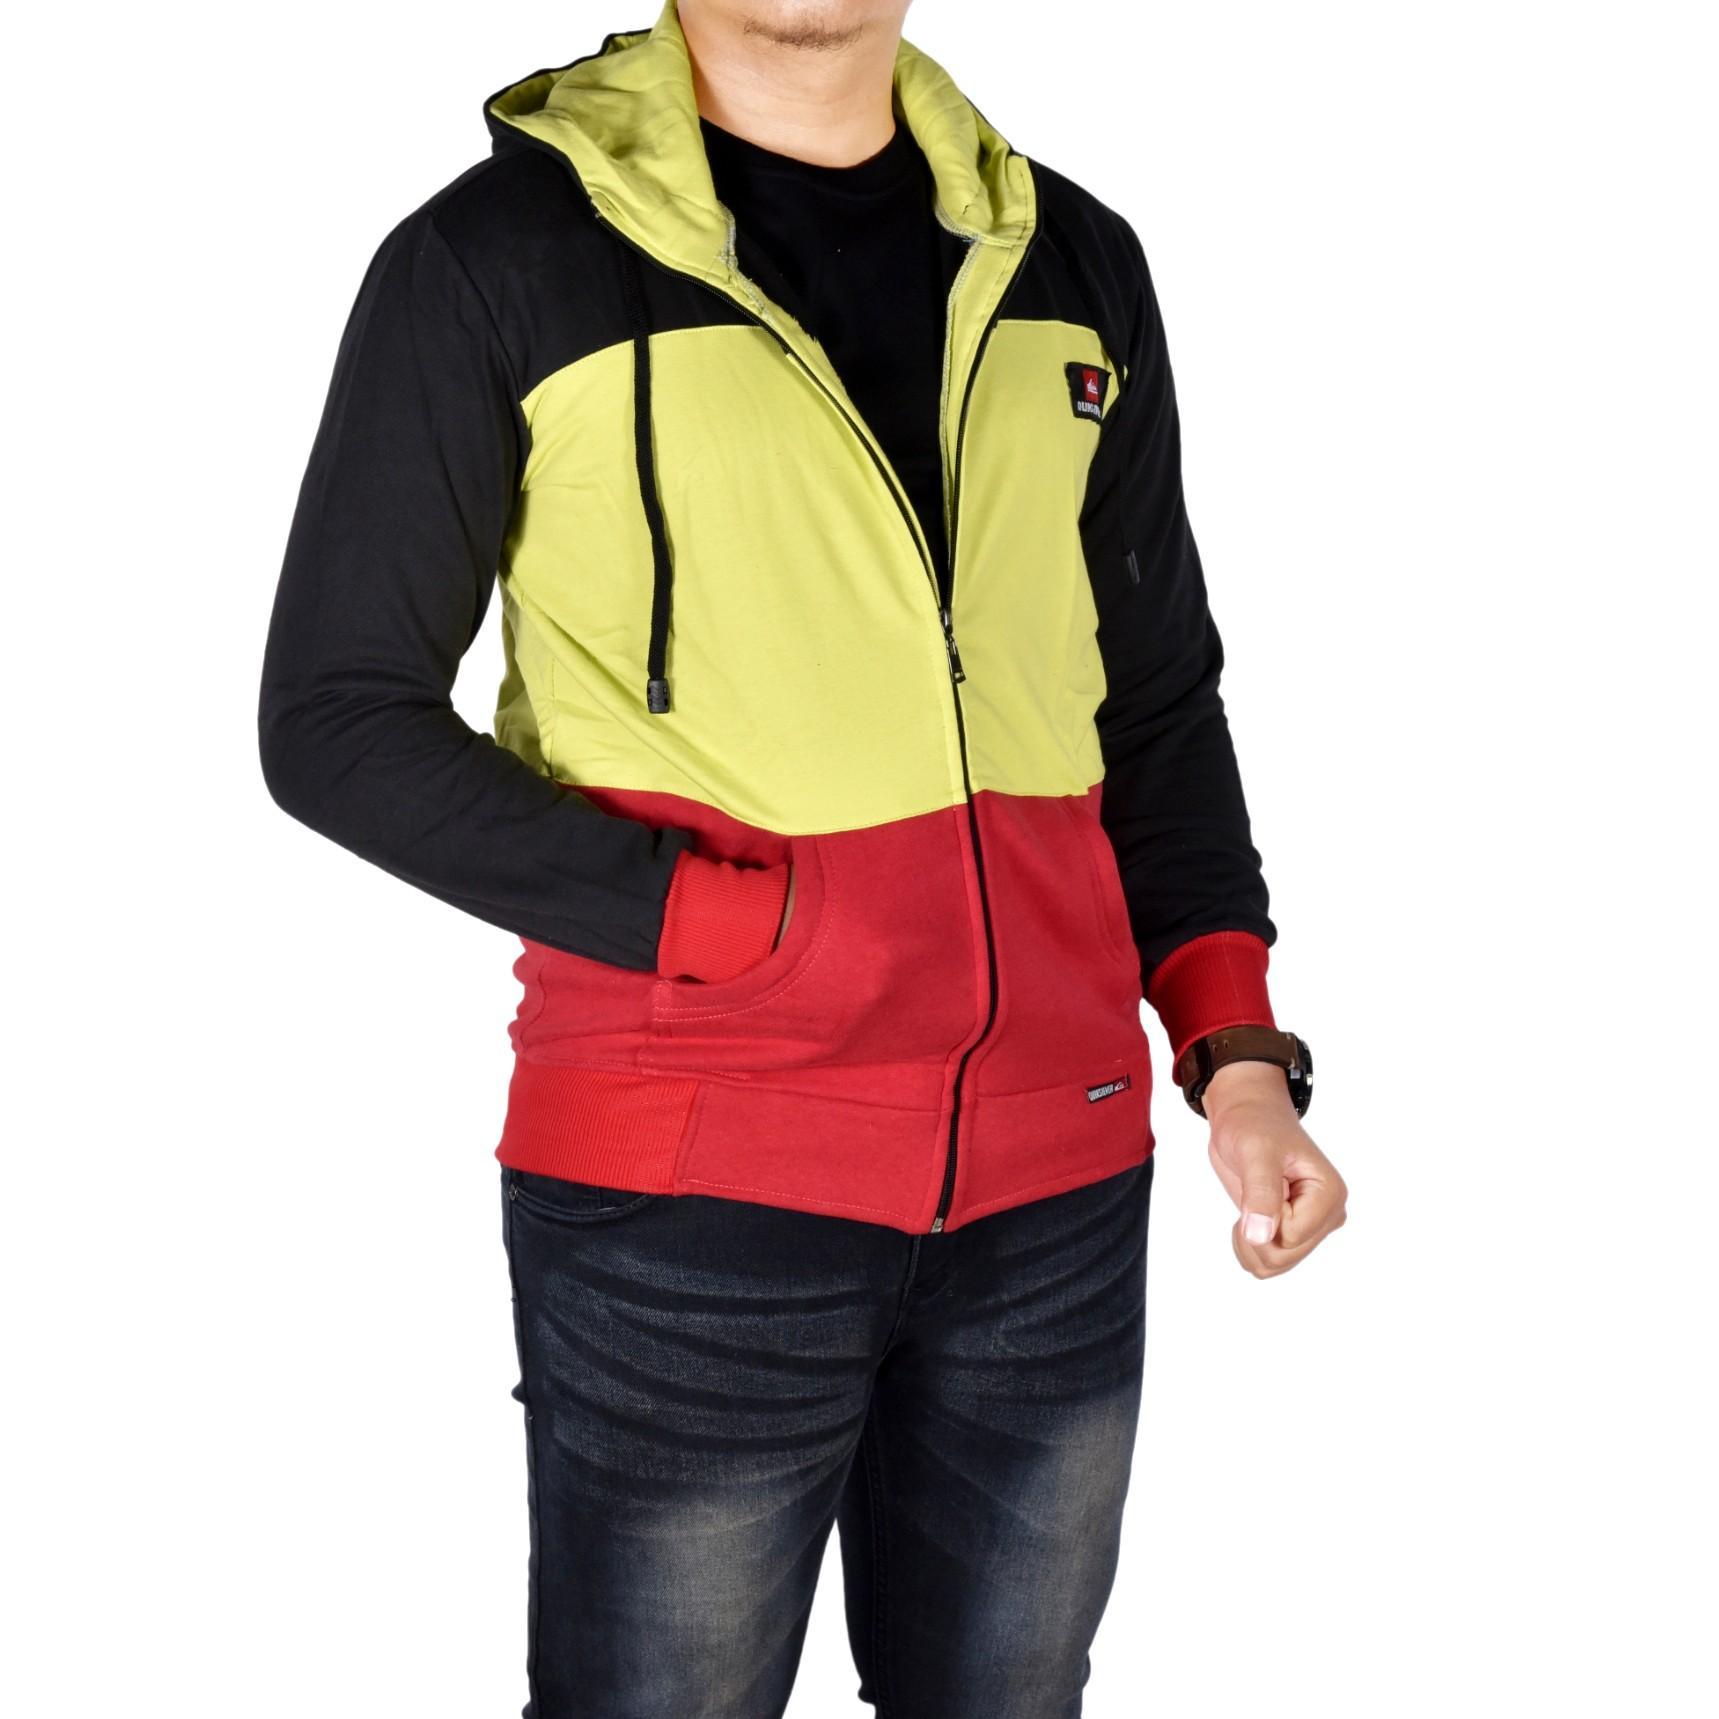 Dgm_Fashion1 Jaket Polos Murah Combinasi Warna /Jaket Denim/Jaket Parasut Pria/Jaket Bomber Pria/Ja